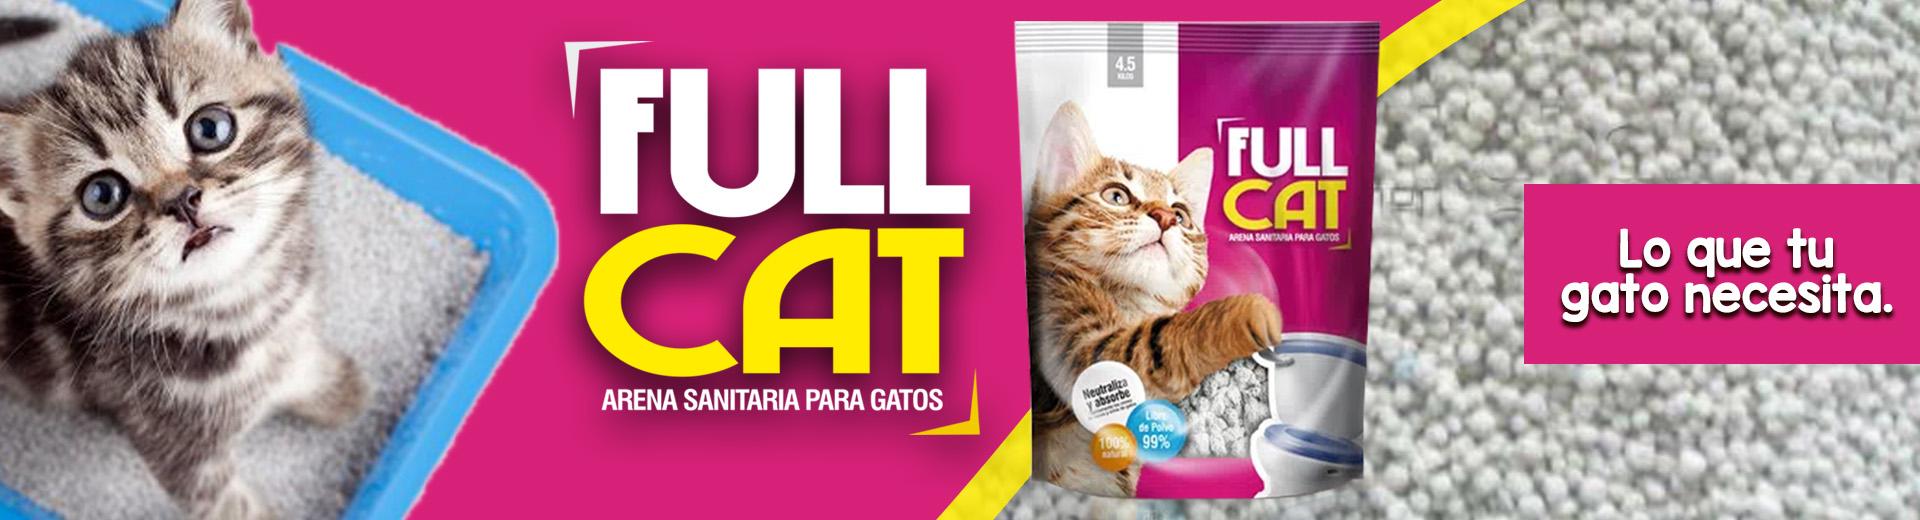 Arena para gatos FULL CAT Comida para perros